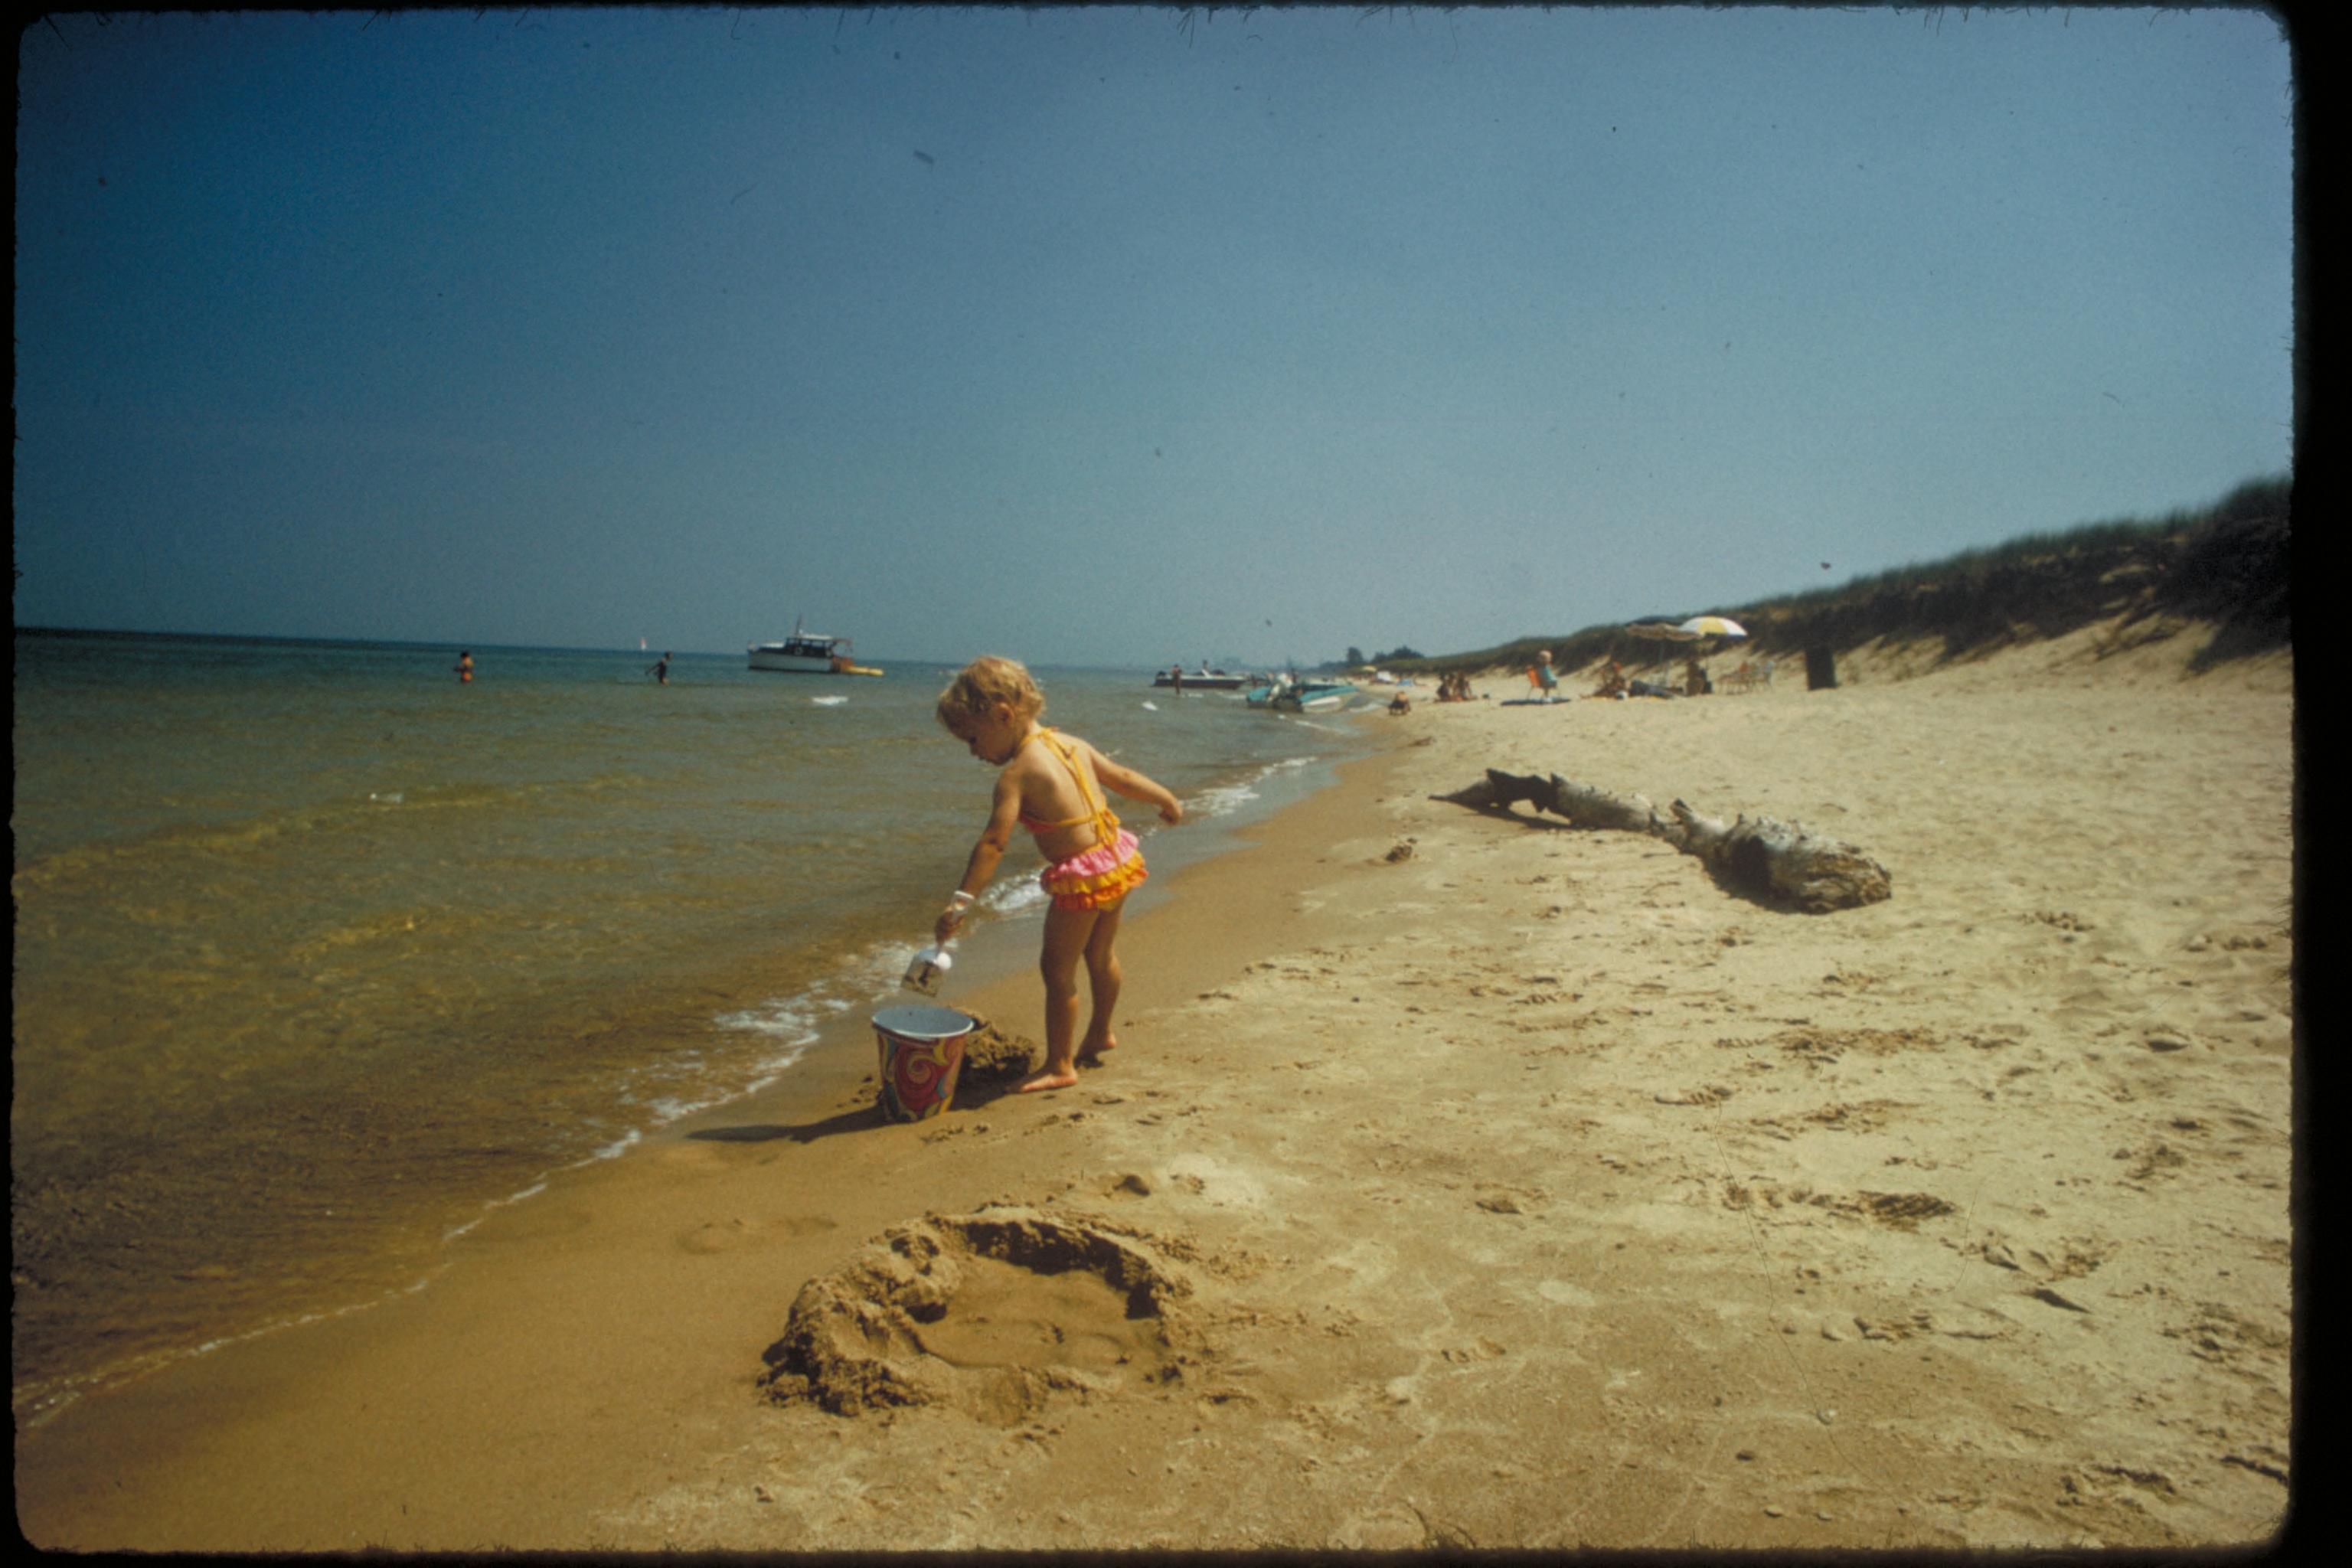 File:Views of Visitors and Nature at Indiana Dunes National